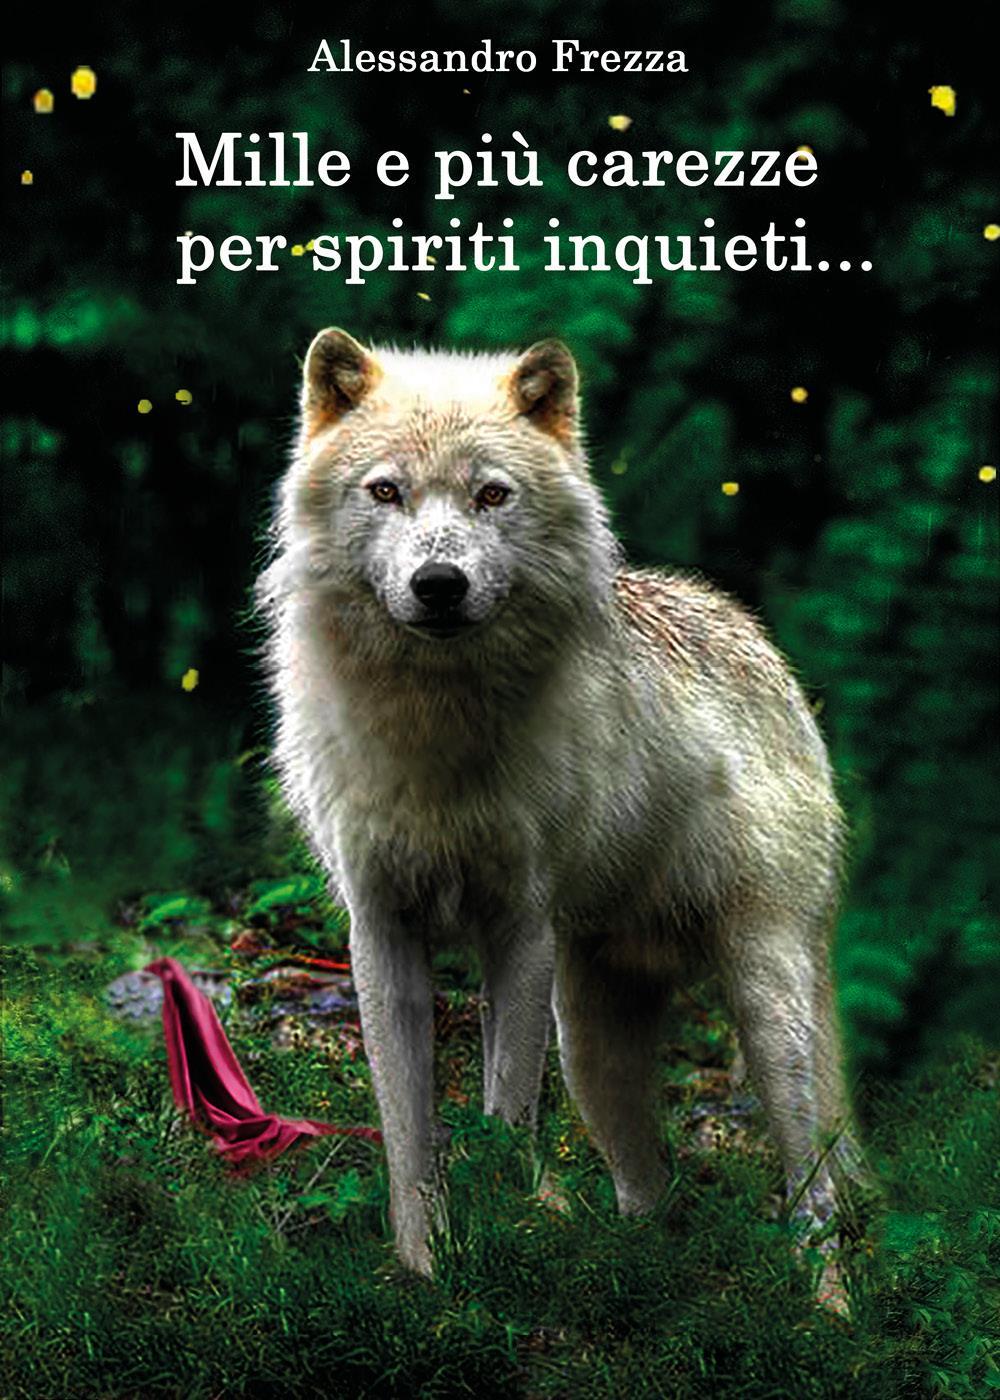 Mille e più carezze per spiriti inquieti